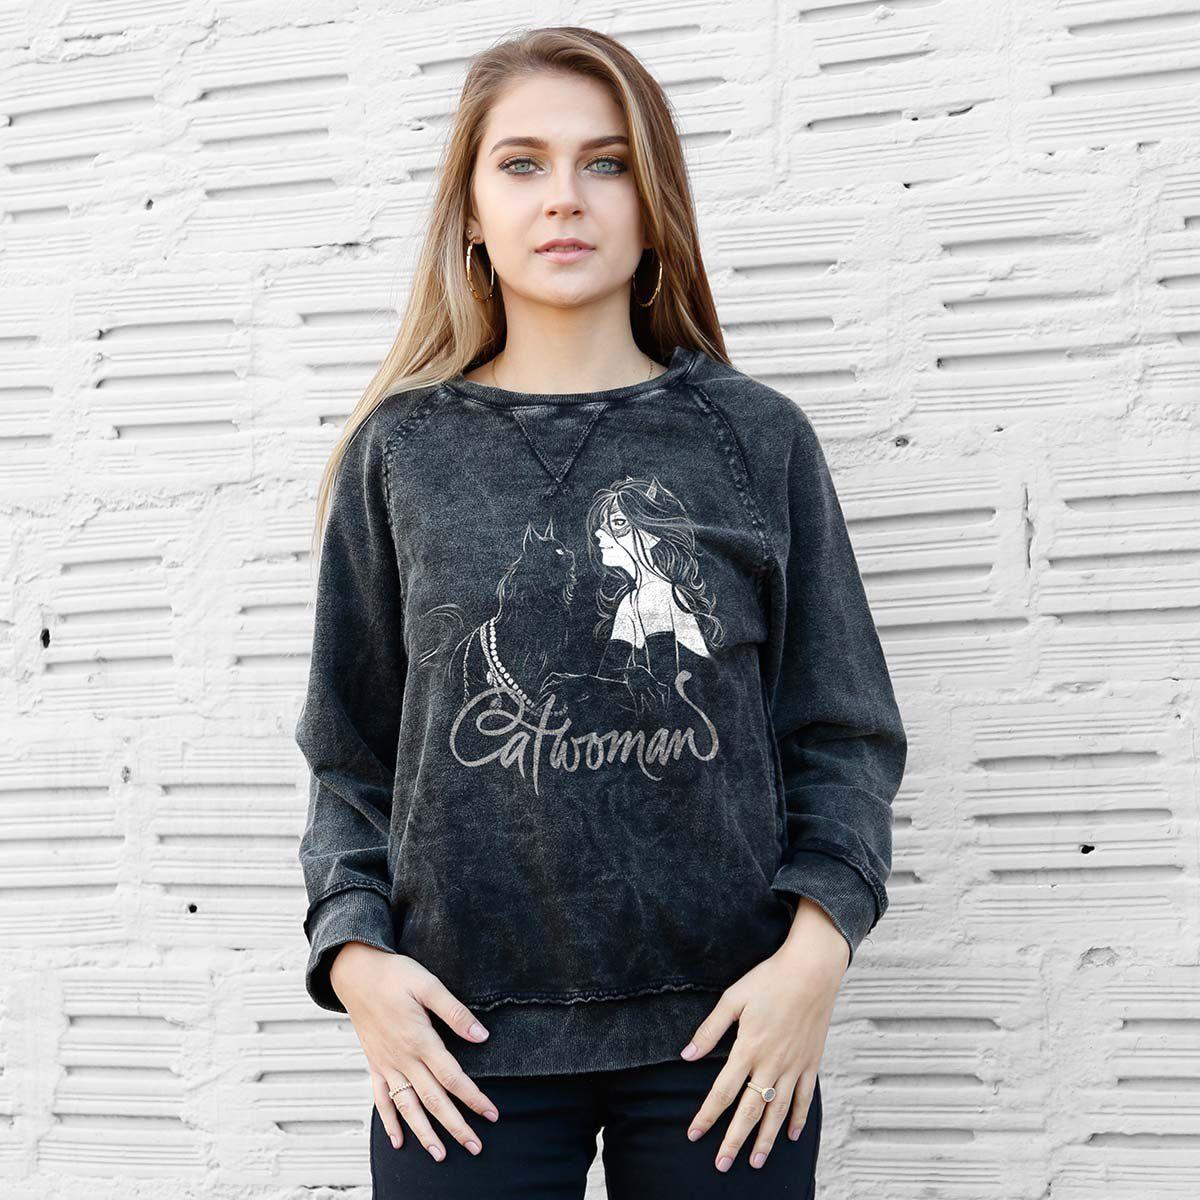 Moletinho Marmorizado Jewel of Catwoman  - bandUP Store Marketplace